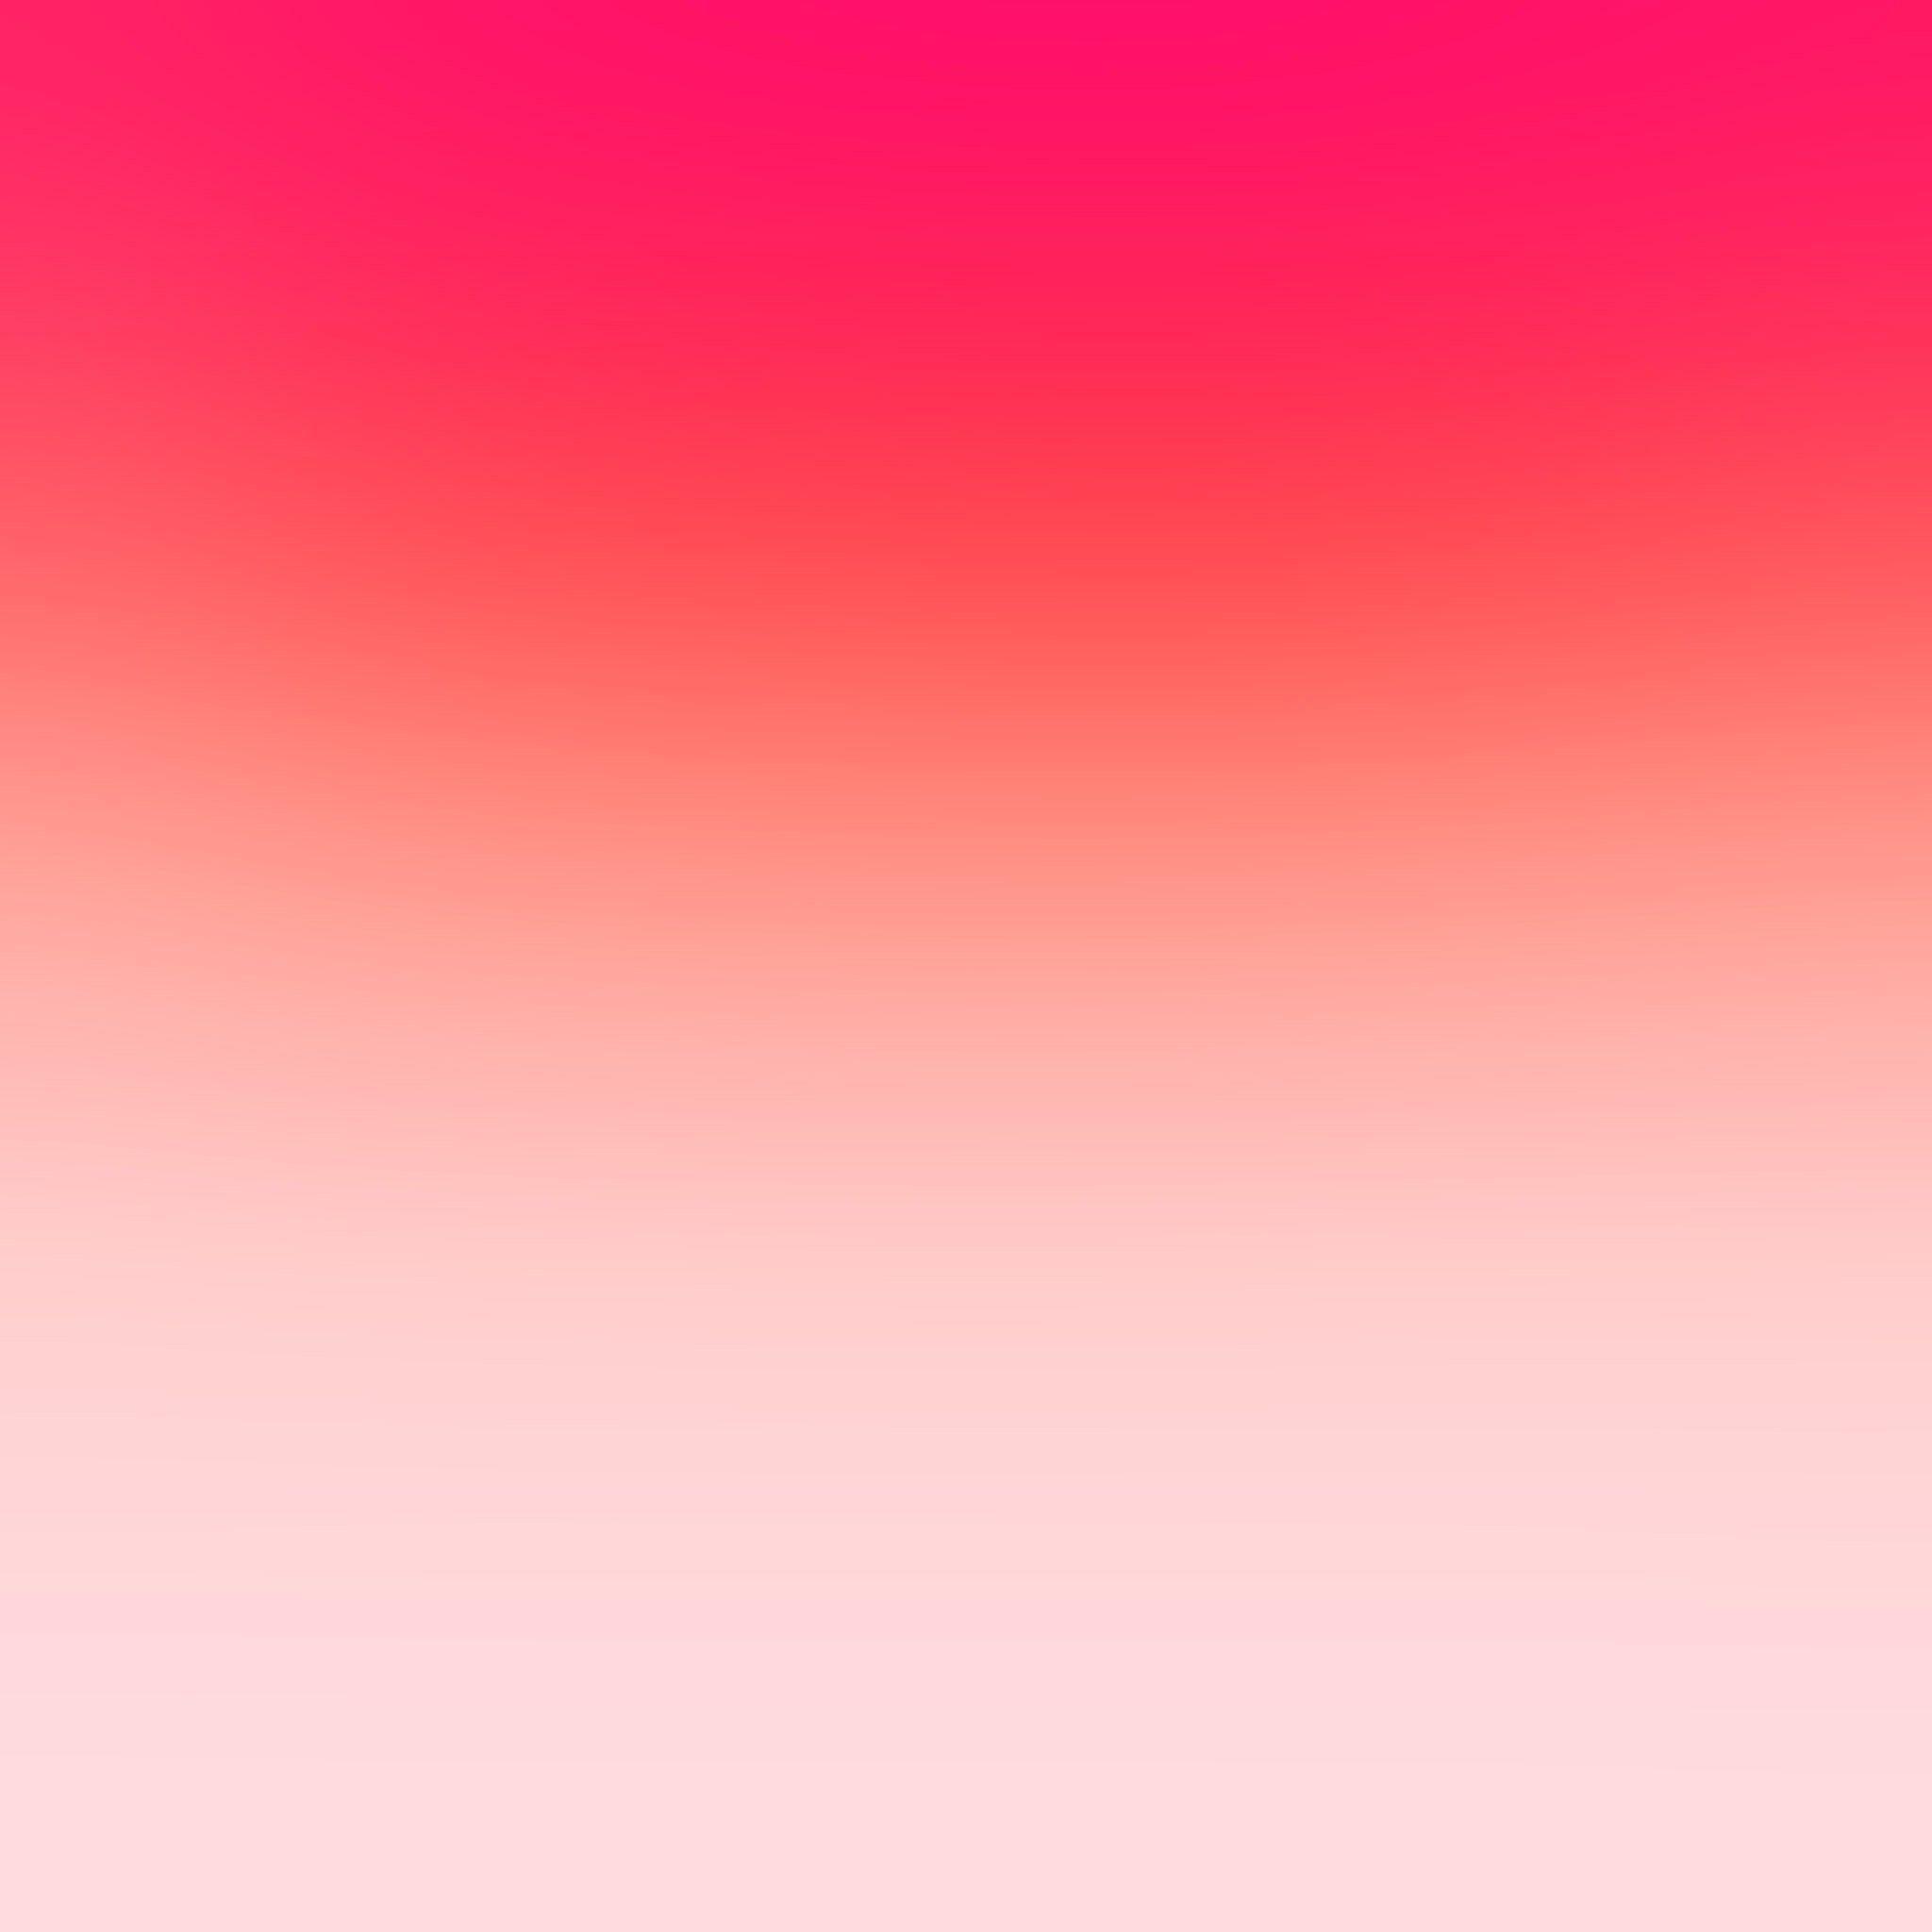 freeios7.com_apple_wallpaper_summer-day_ipad_retina.jpg 2,048×2,048픽셀